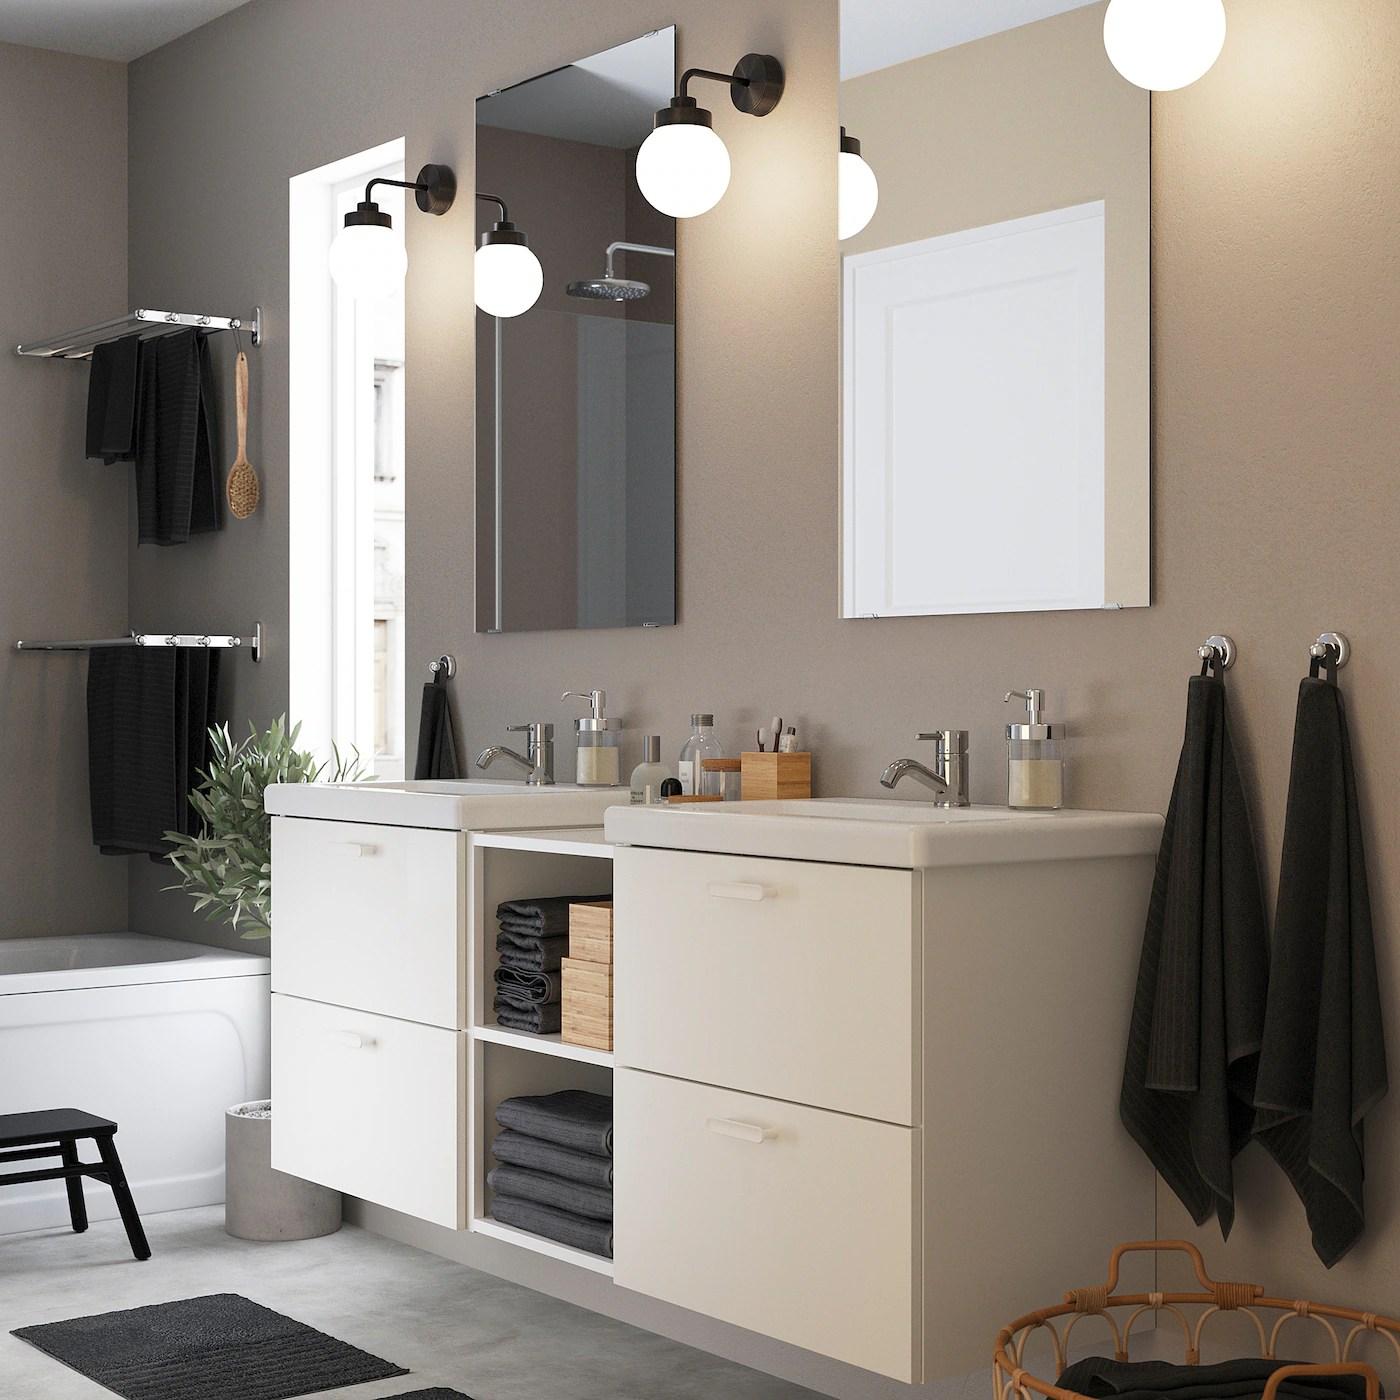 Enhet Tvallen Mobilier Salle De Bain 15 Pieces Blanc Pilkan Mitigeur Lavabo Ikea